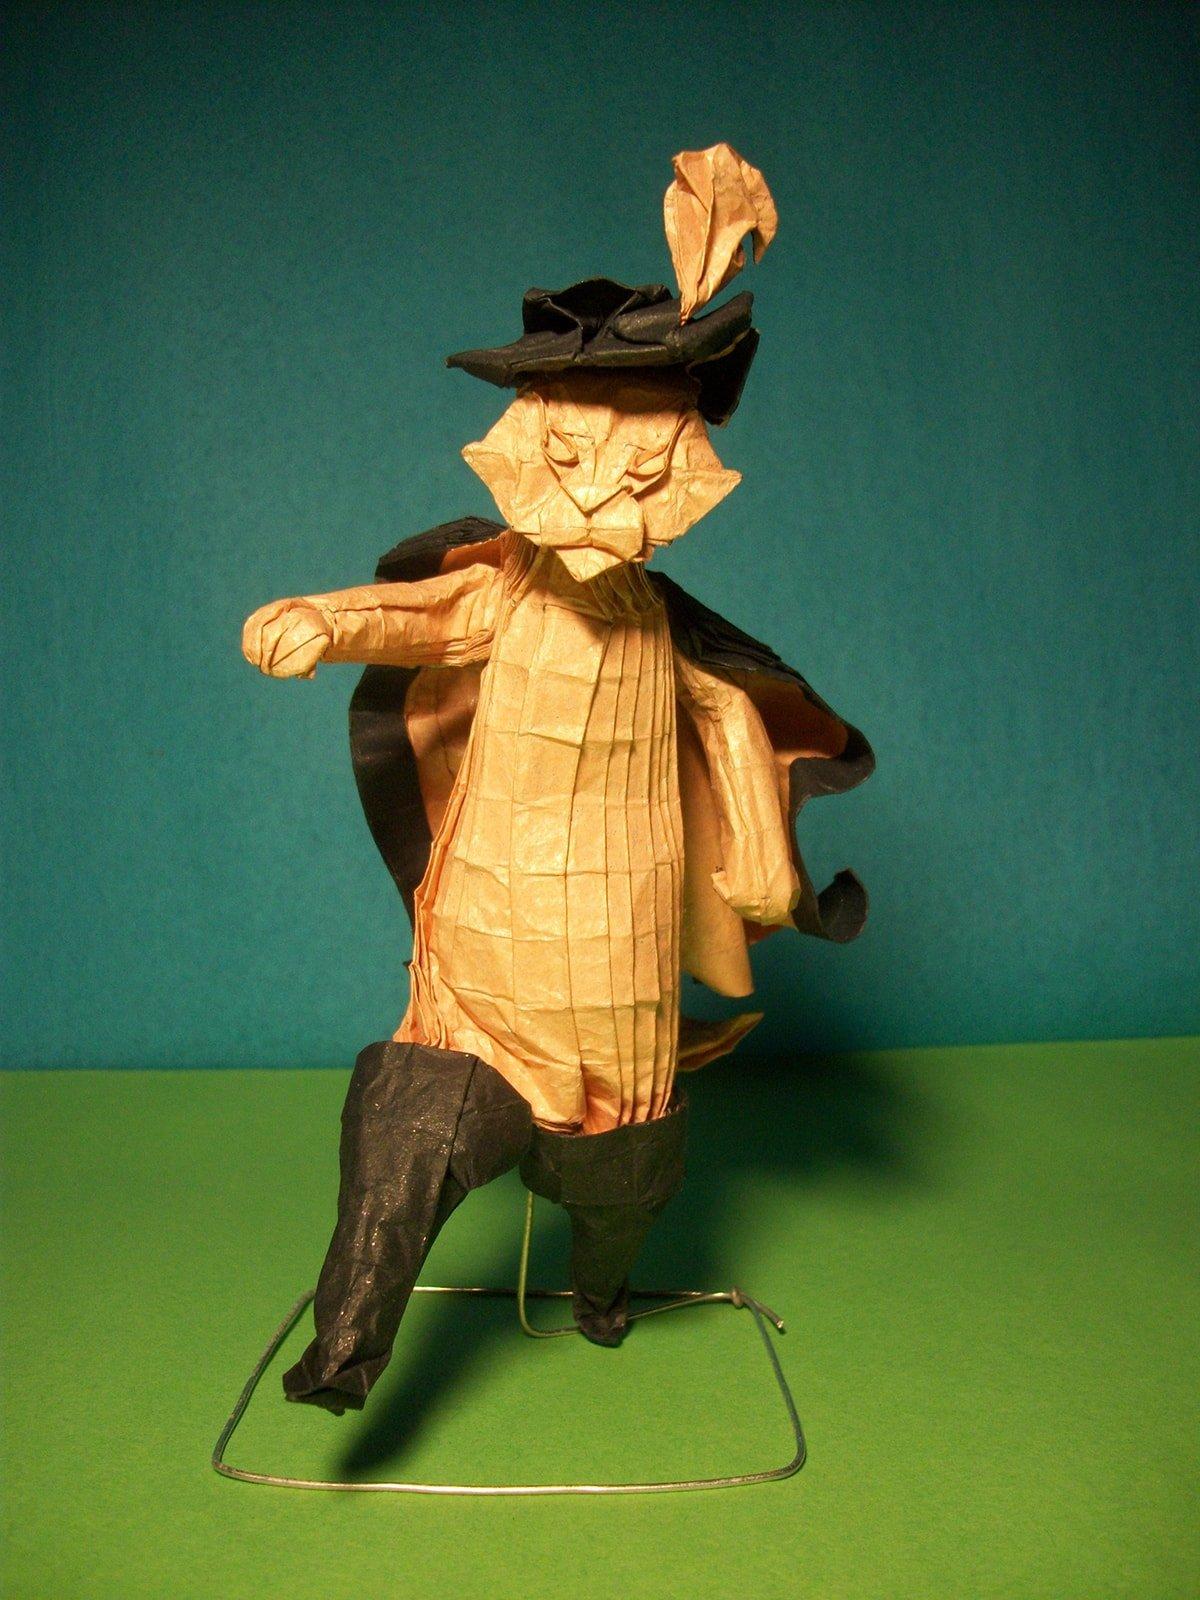 Puss in Boots by Hubert Villanueve